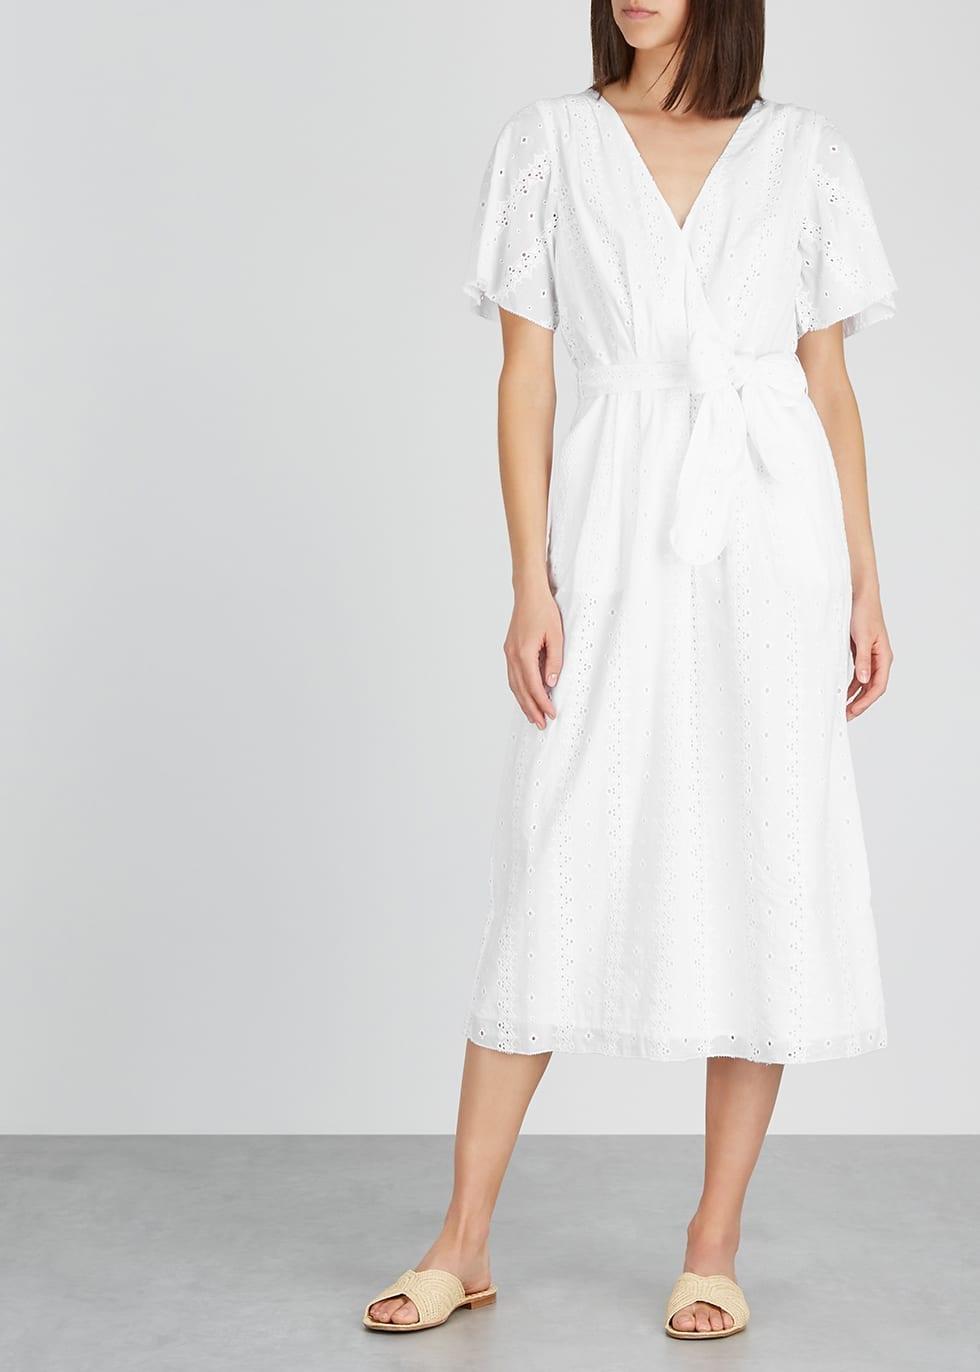 JOIE Azariah Broderie Anglaise Midi Dress